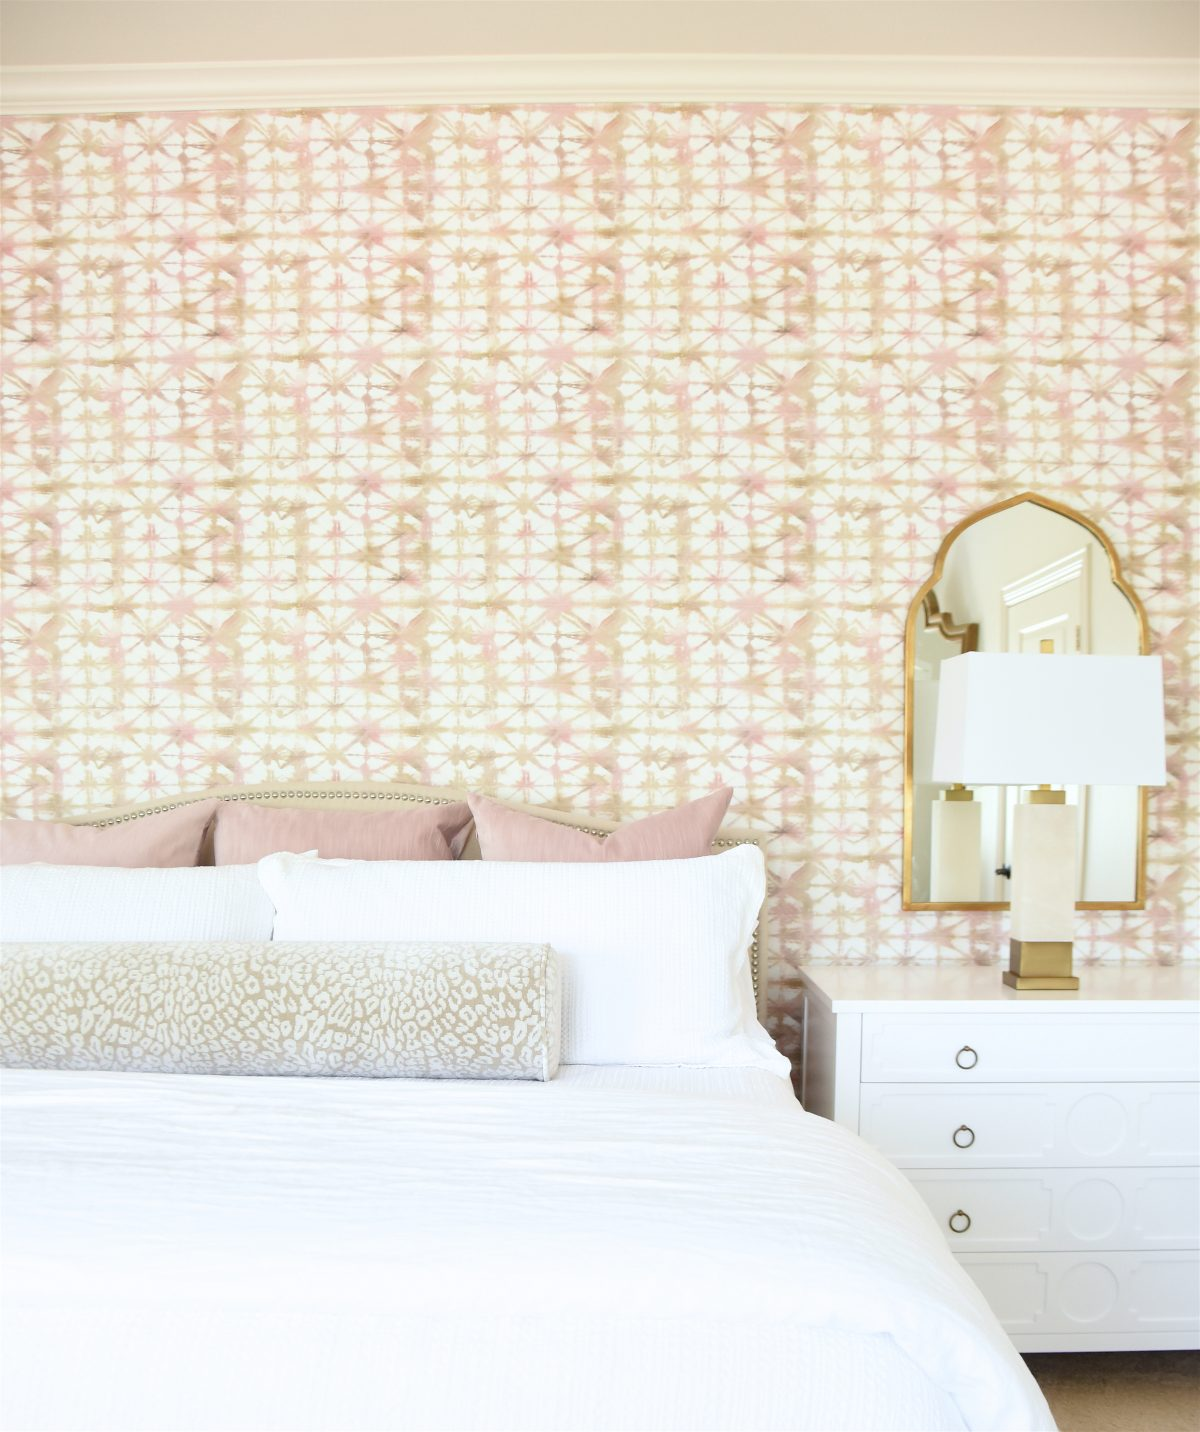 Bedroom decor - Anthropologie wallpaper